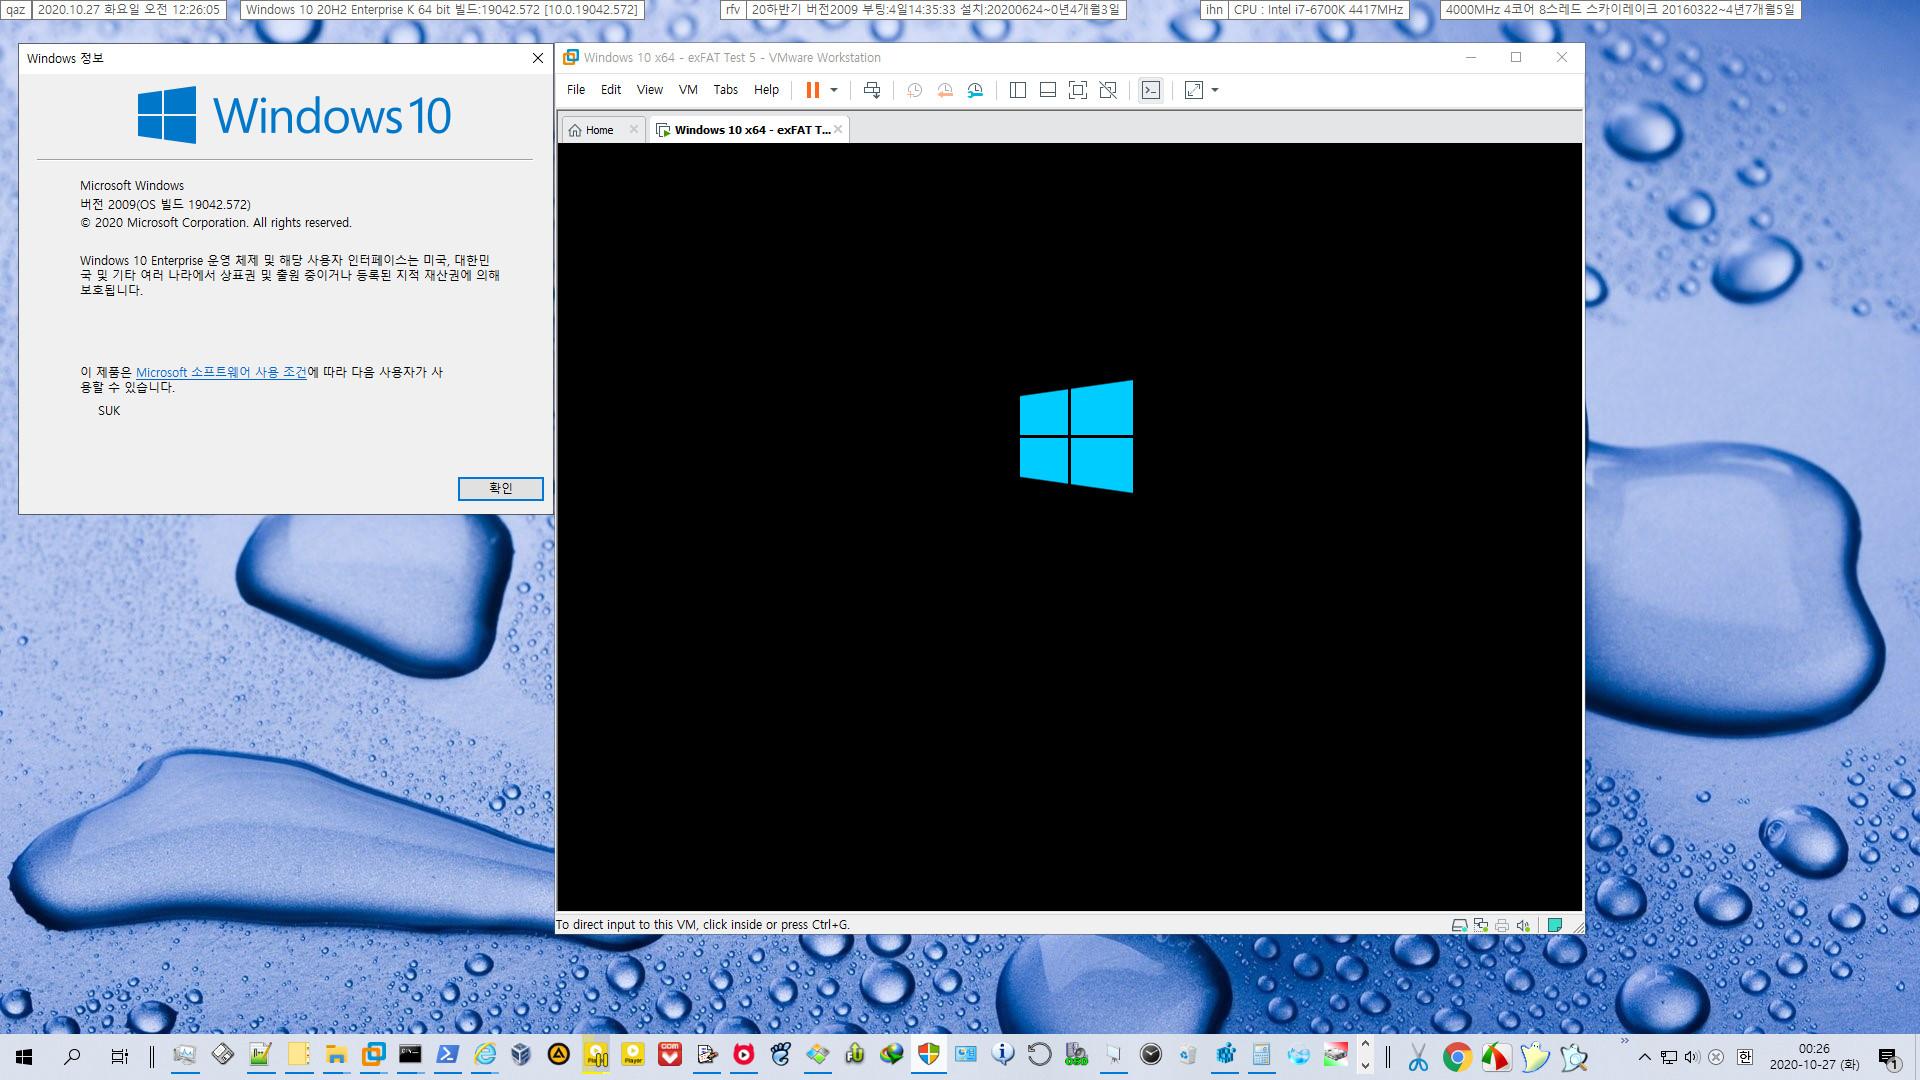 exFAT 포맷으로도 VHD 부팅이 Windows 10 버전 1903부터 된다고 하여 테스트 - 생고생만 하다가 컴퓨터 먹통 2번이나 되고 그만뒀습니다 2020-10-27_002605.jpg